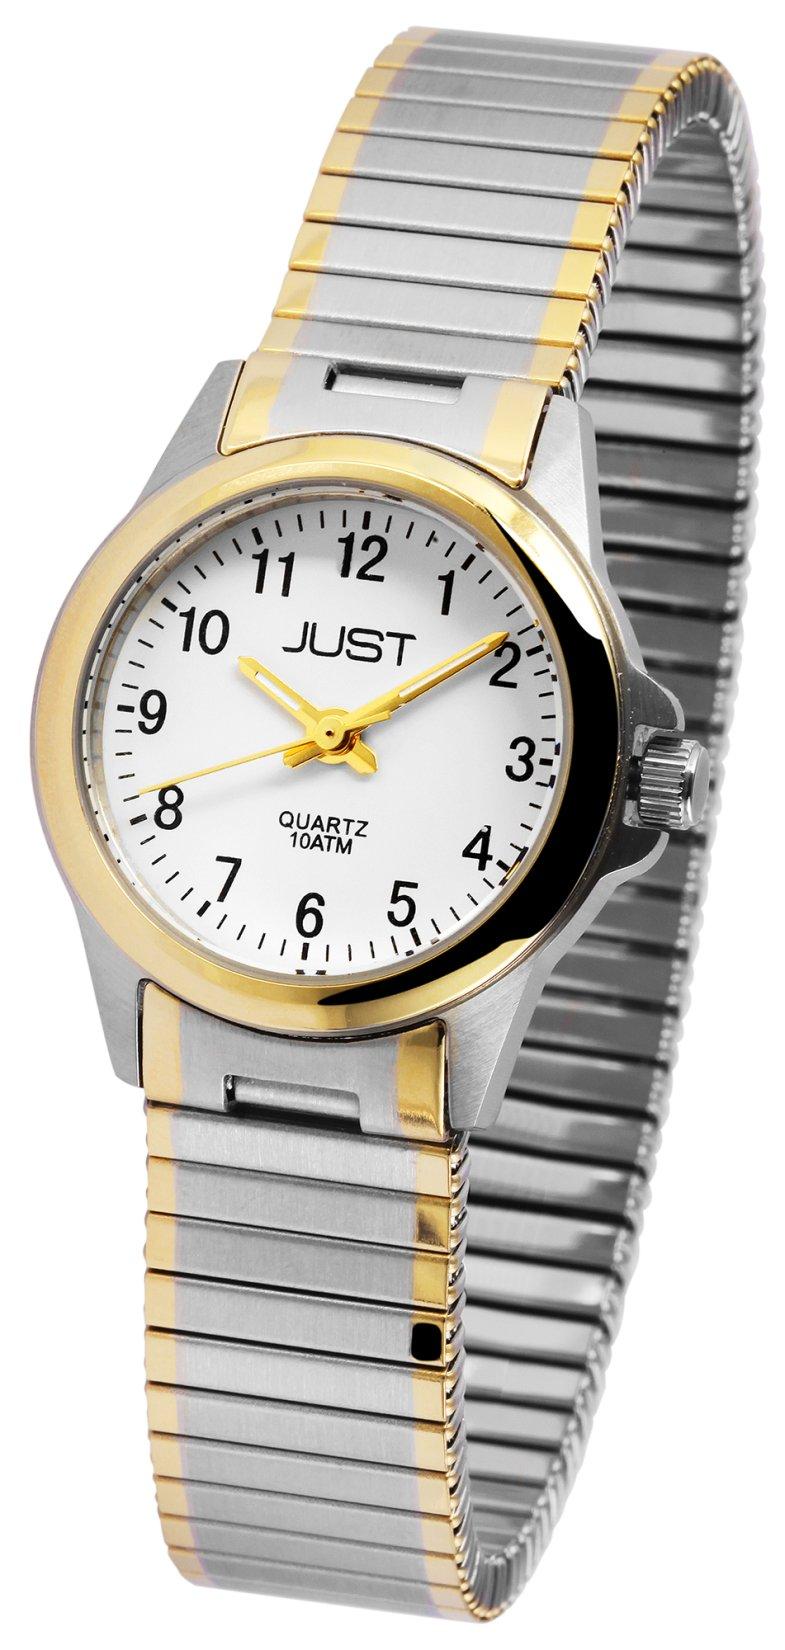 JUST women's watch 10103-005